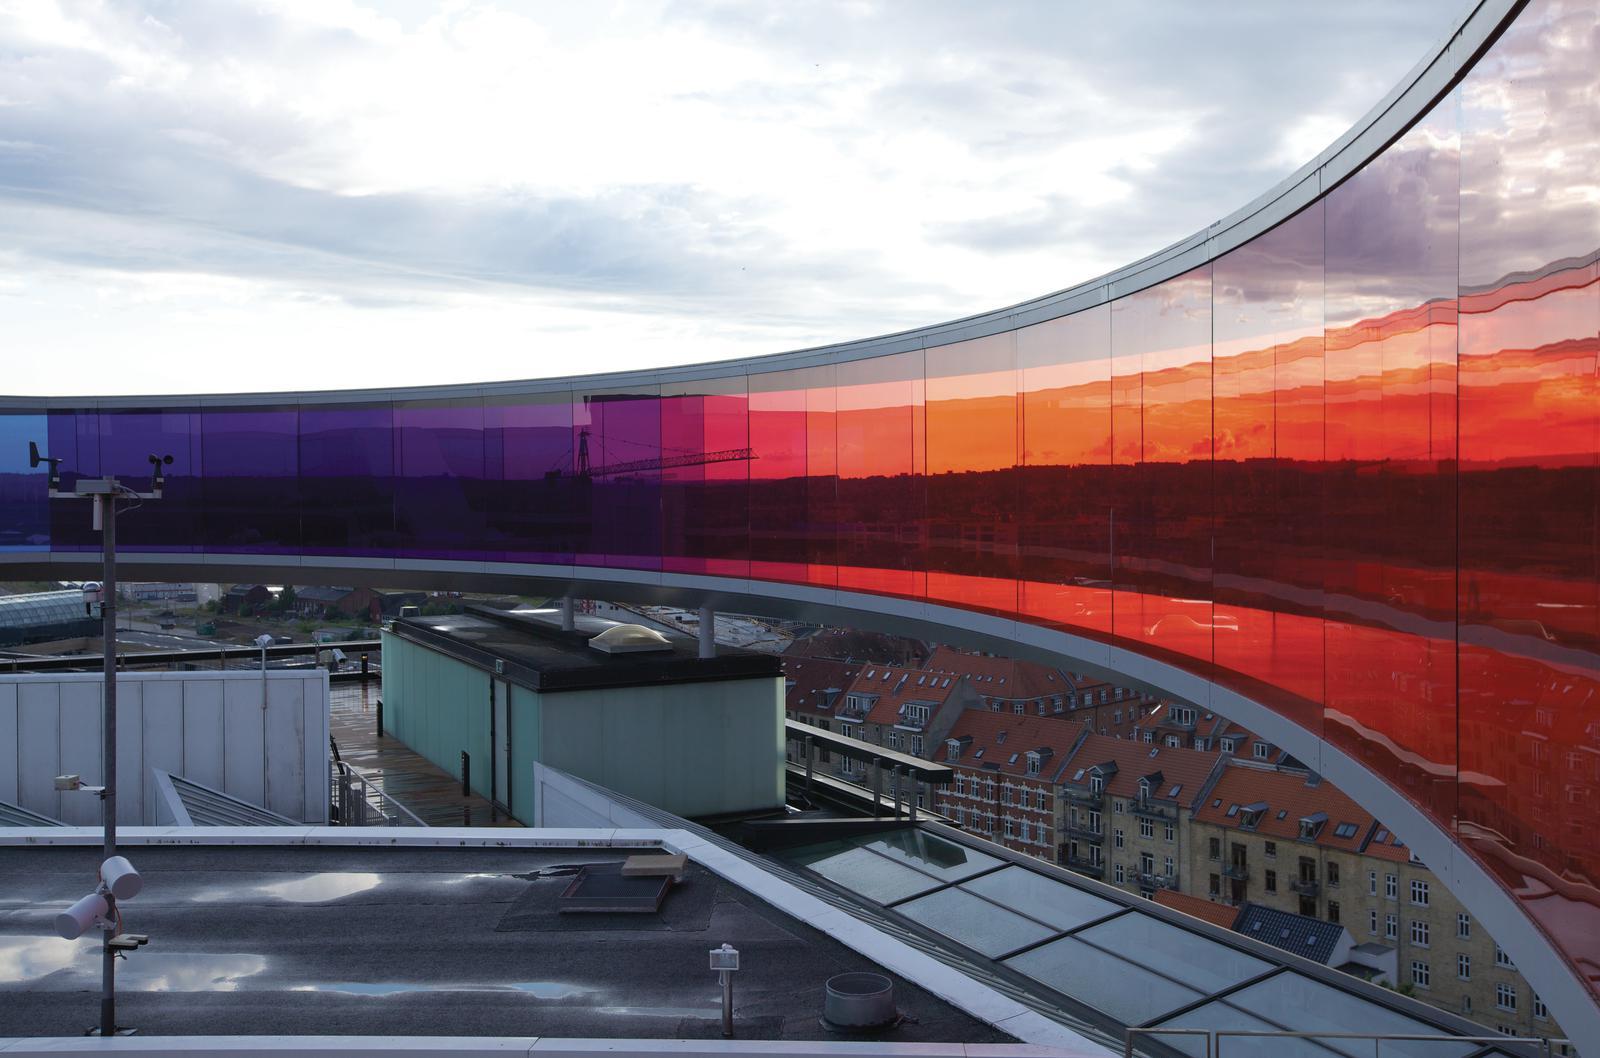 Olafur Eliasson; Your rainbow panorama, 2006-2011; Installation view: ARoS Aarhus Kunstmuseum, Denmark, 2011; Photo: Thilo Frank / Studio Olafur Eliasson / Courtesy: AaRos Aarhus Kunstmueseum © 2006-2011 Olafur Eliasson